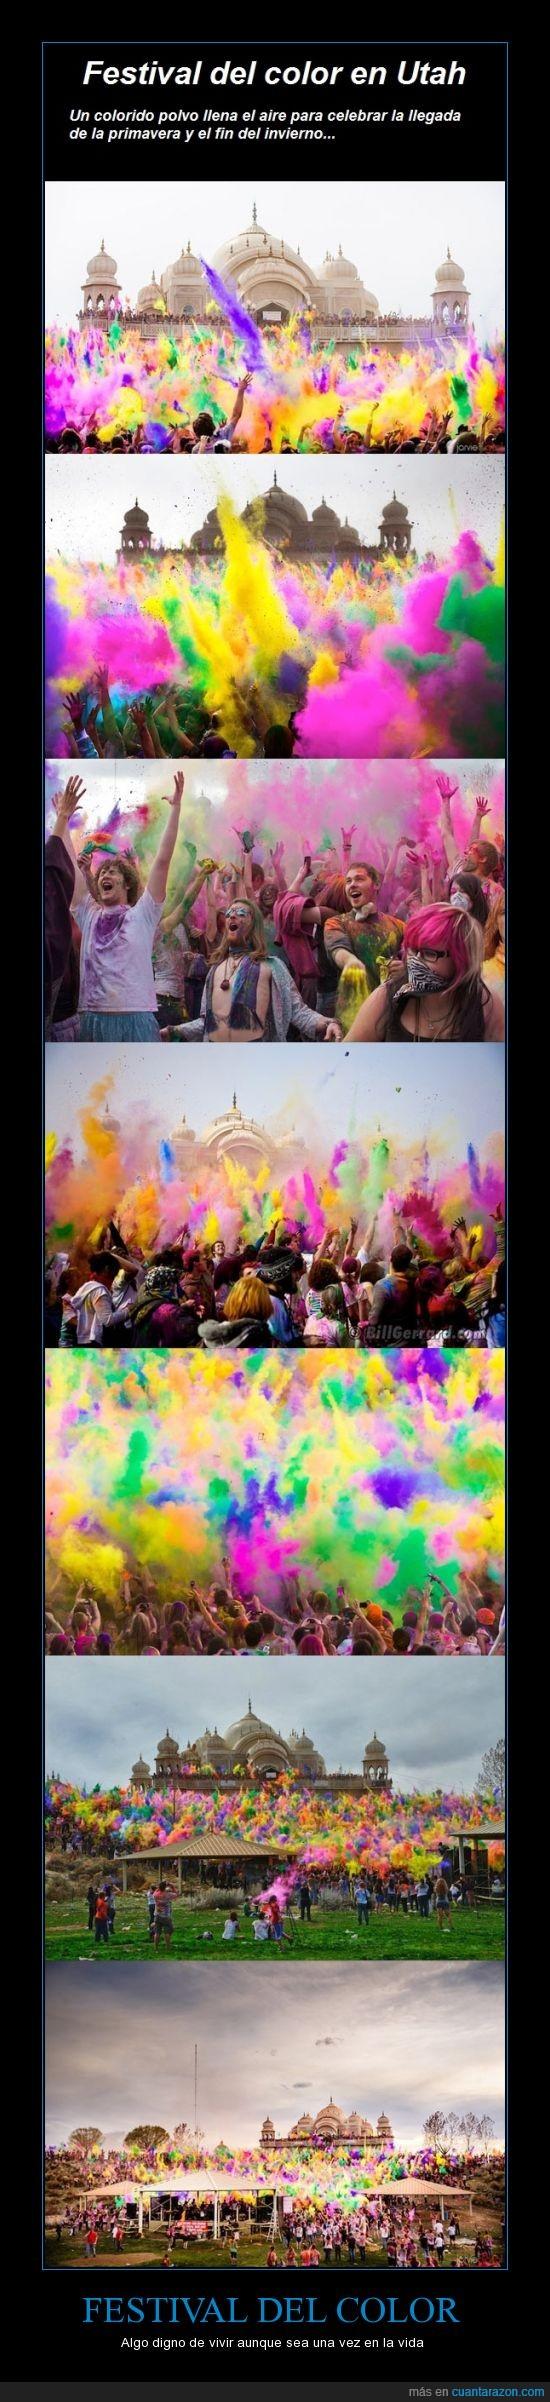 color,final,holifestival,invierno,pintura,primavera